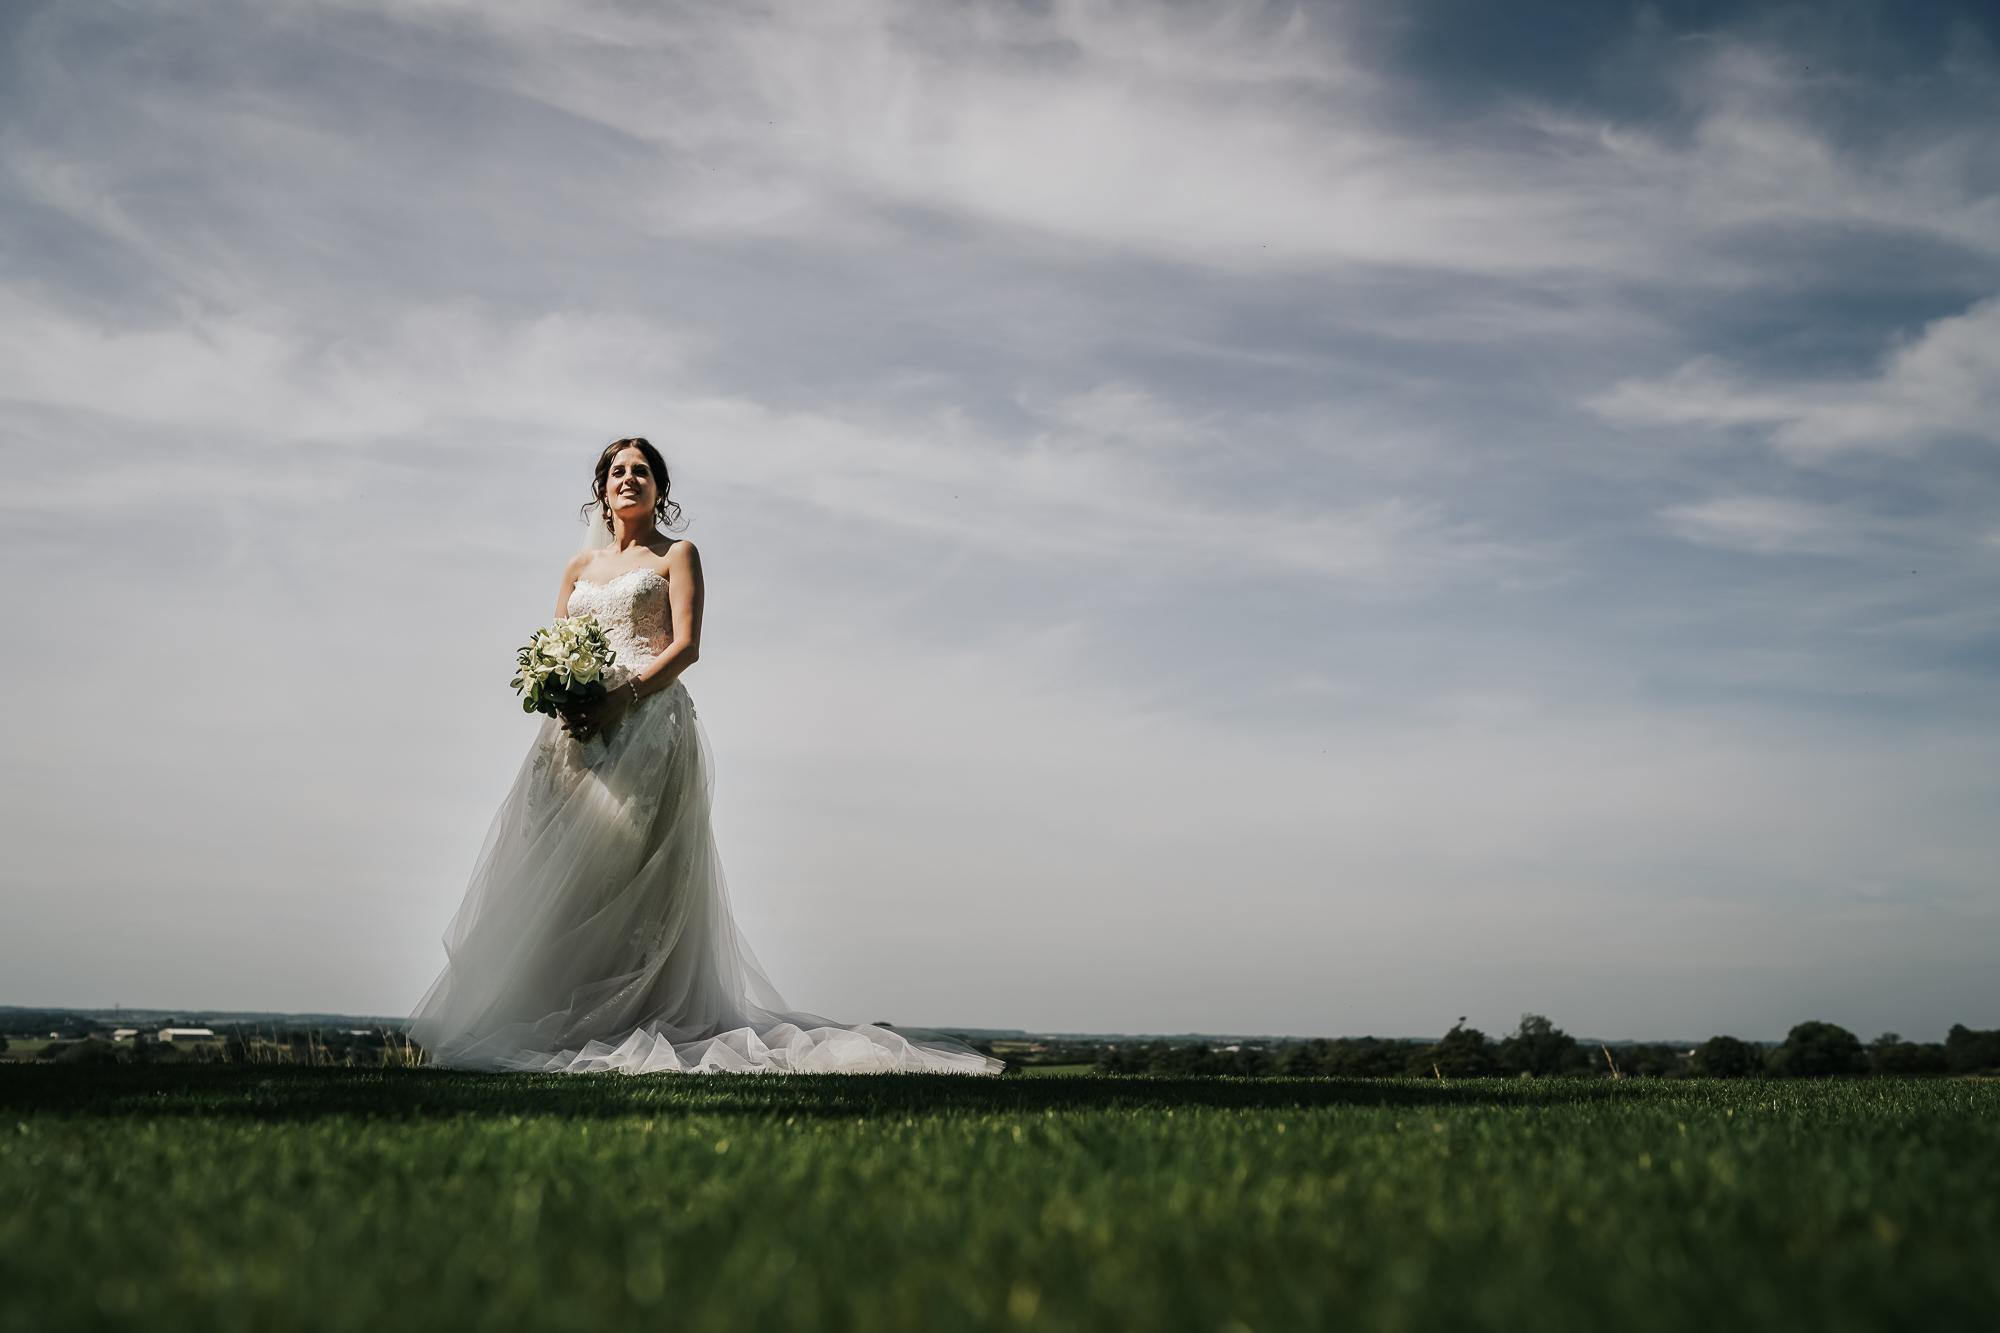 West Tower Wedding Venue Orkskirk Lancashire Wedding Photography cheshire wedding photographer (26 of 47).jpg